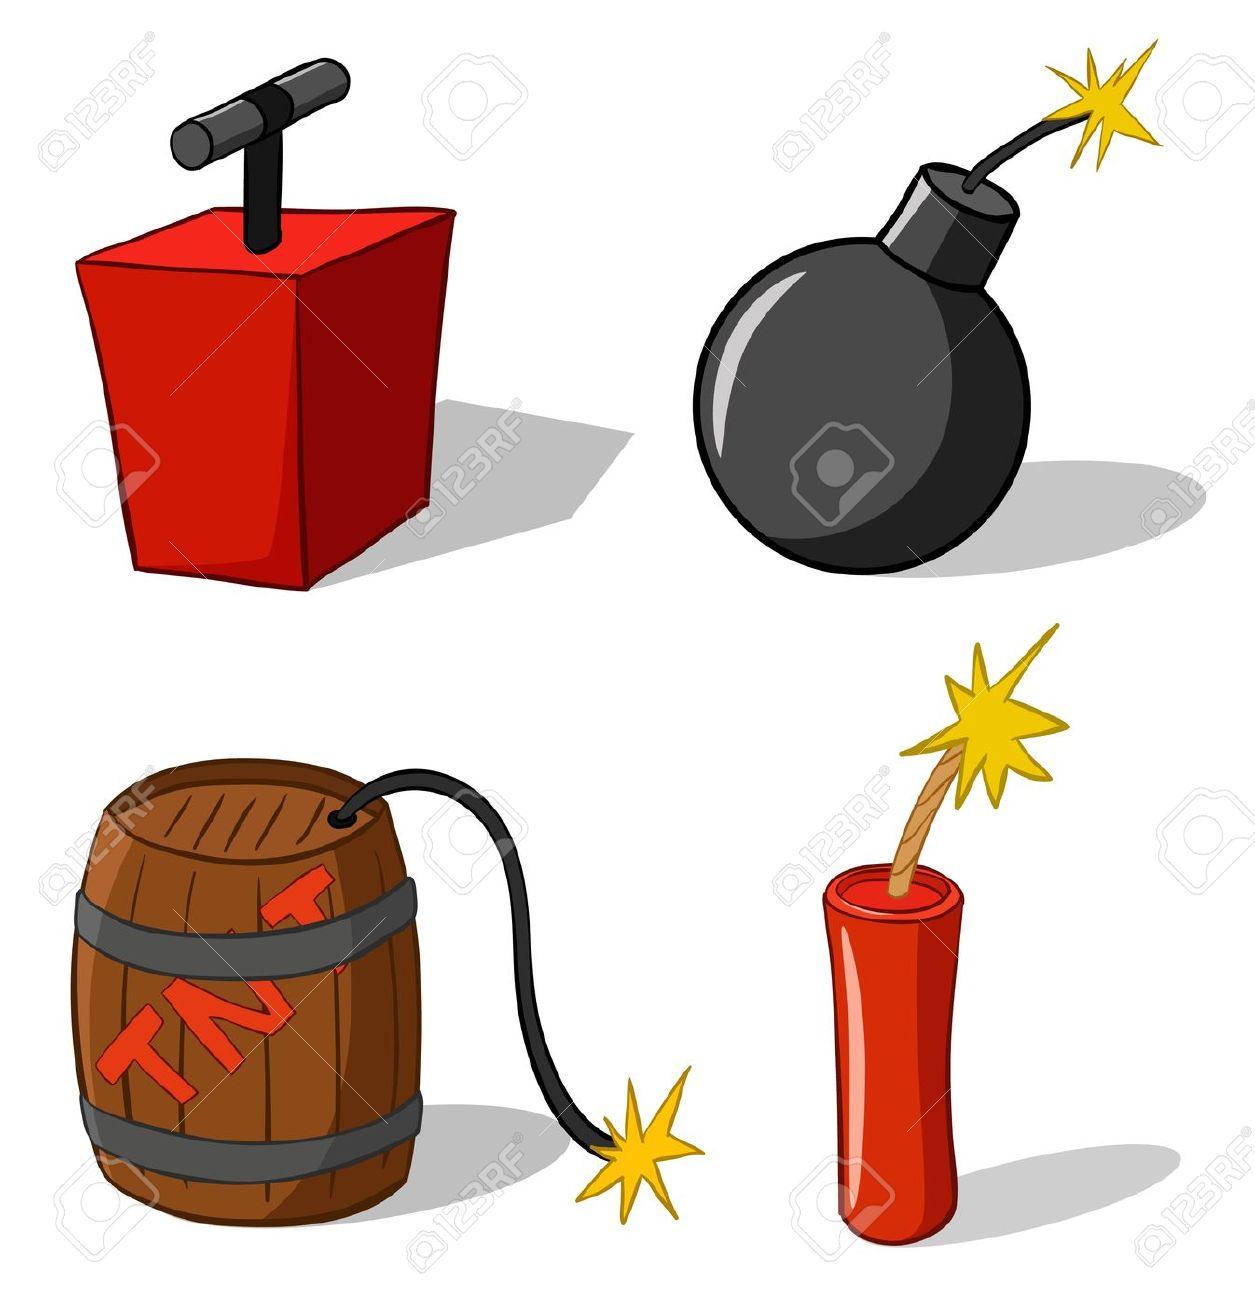 explosive sign: explosive bomb.